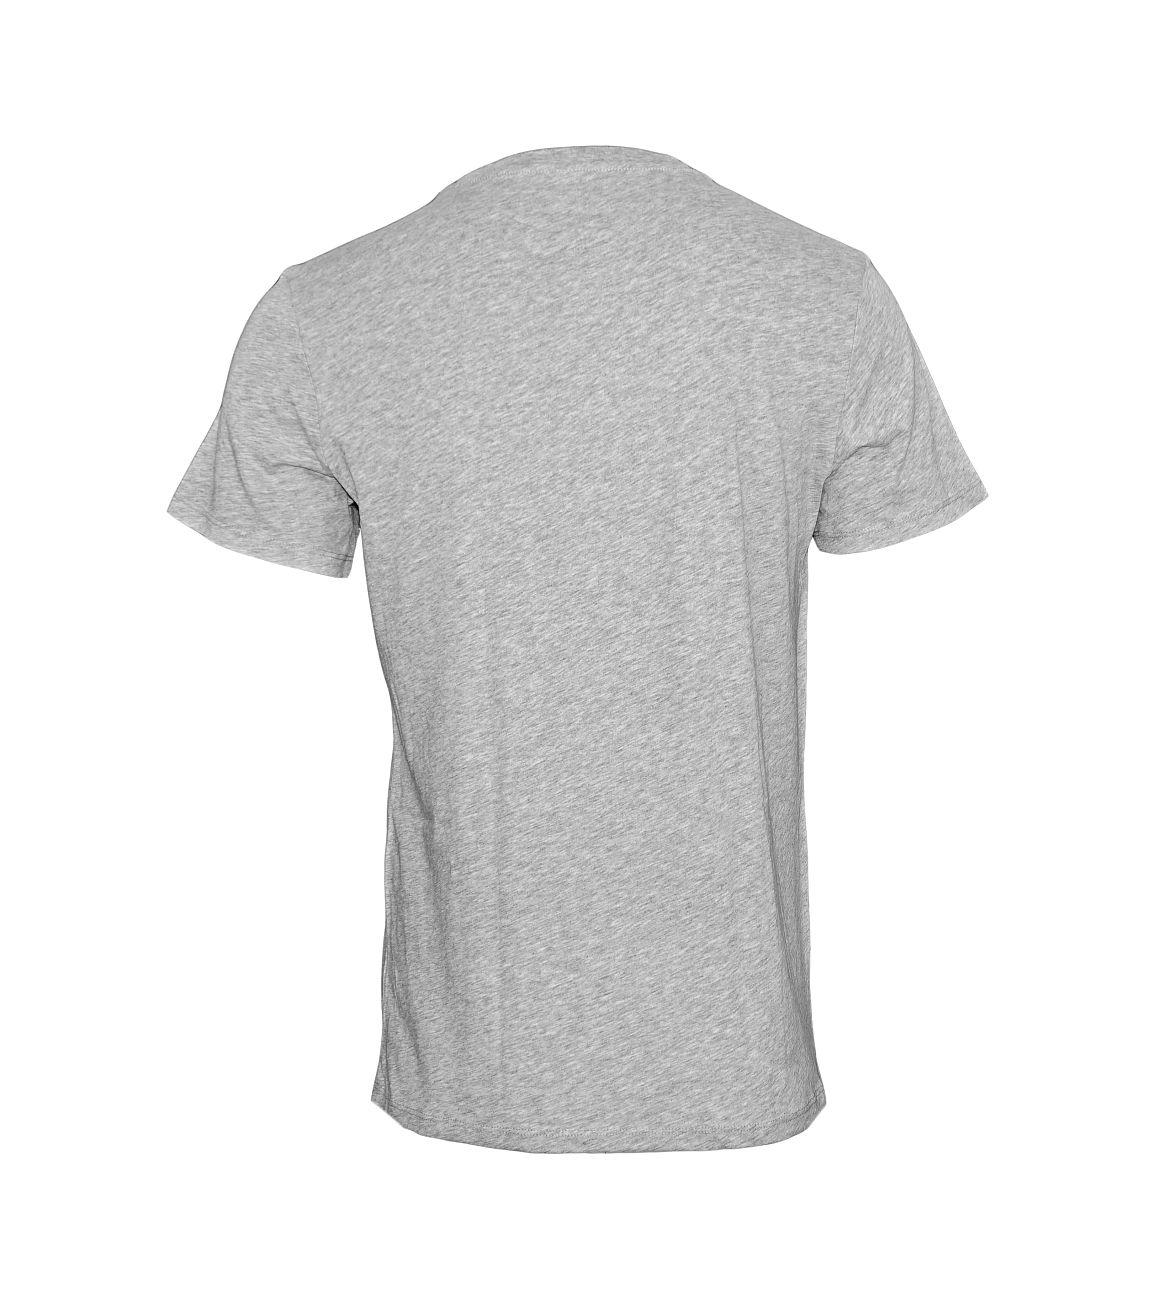 G-Star RAW 2er Pack T-Shirt Regular Fit Rundhals D07202-2757-906 Grey Htr F18-GSP1